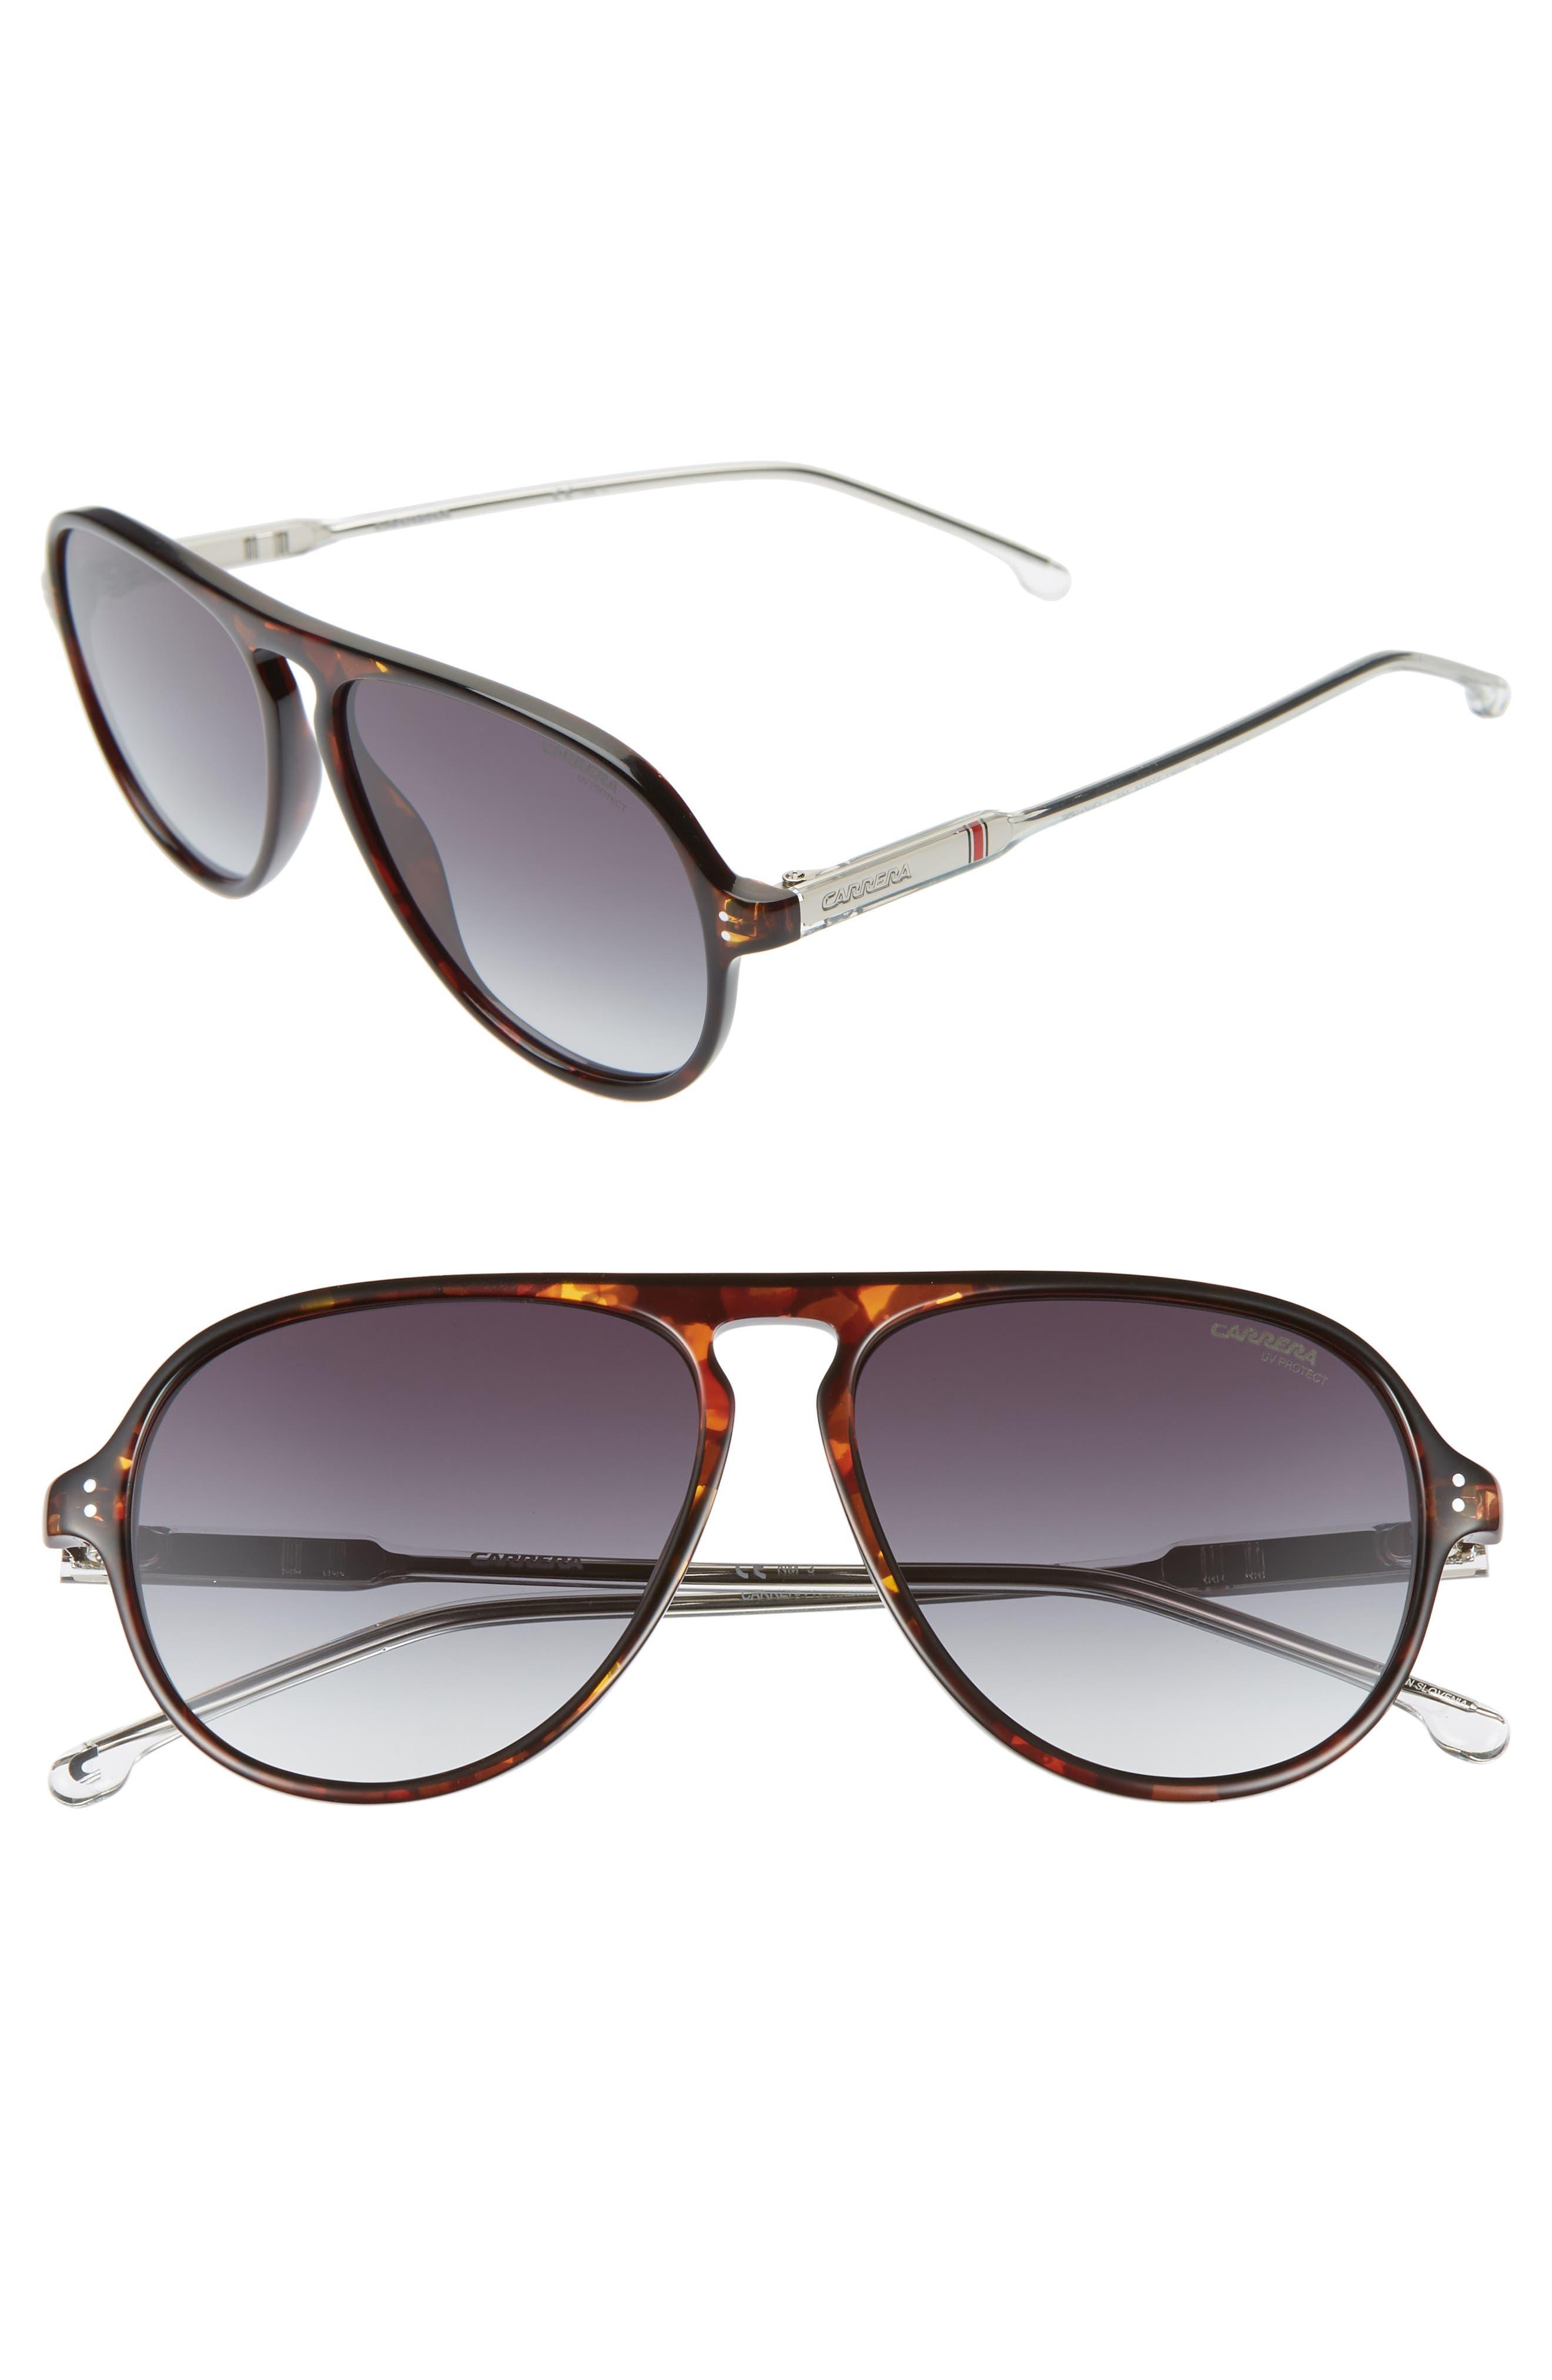 Carrera Eyewear 57Mm Aviator Sunglasses - Dark Havana